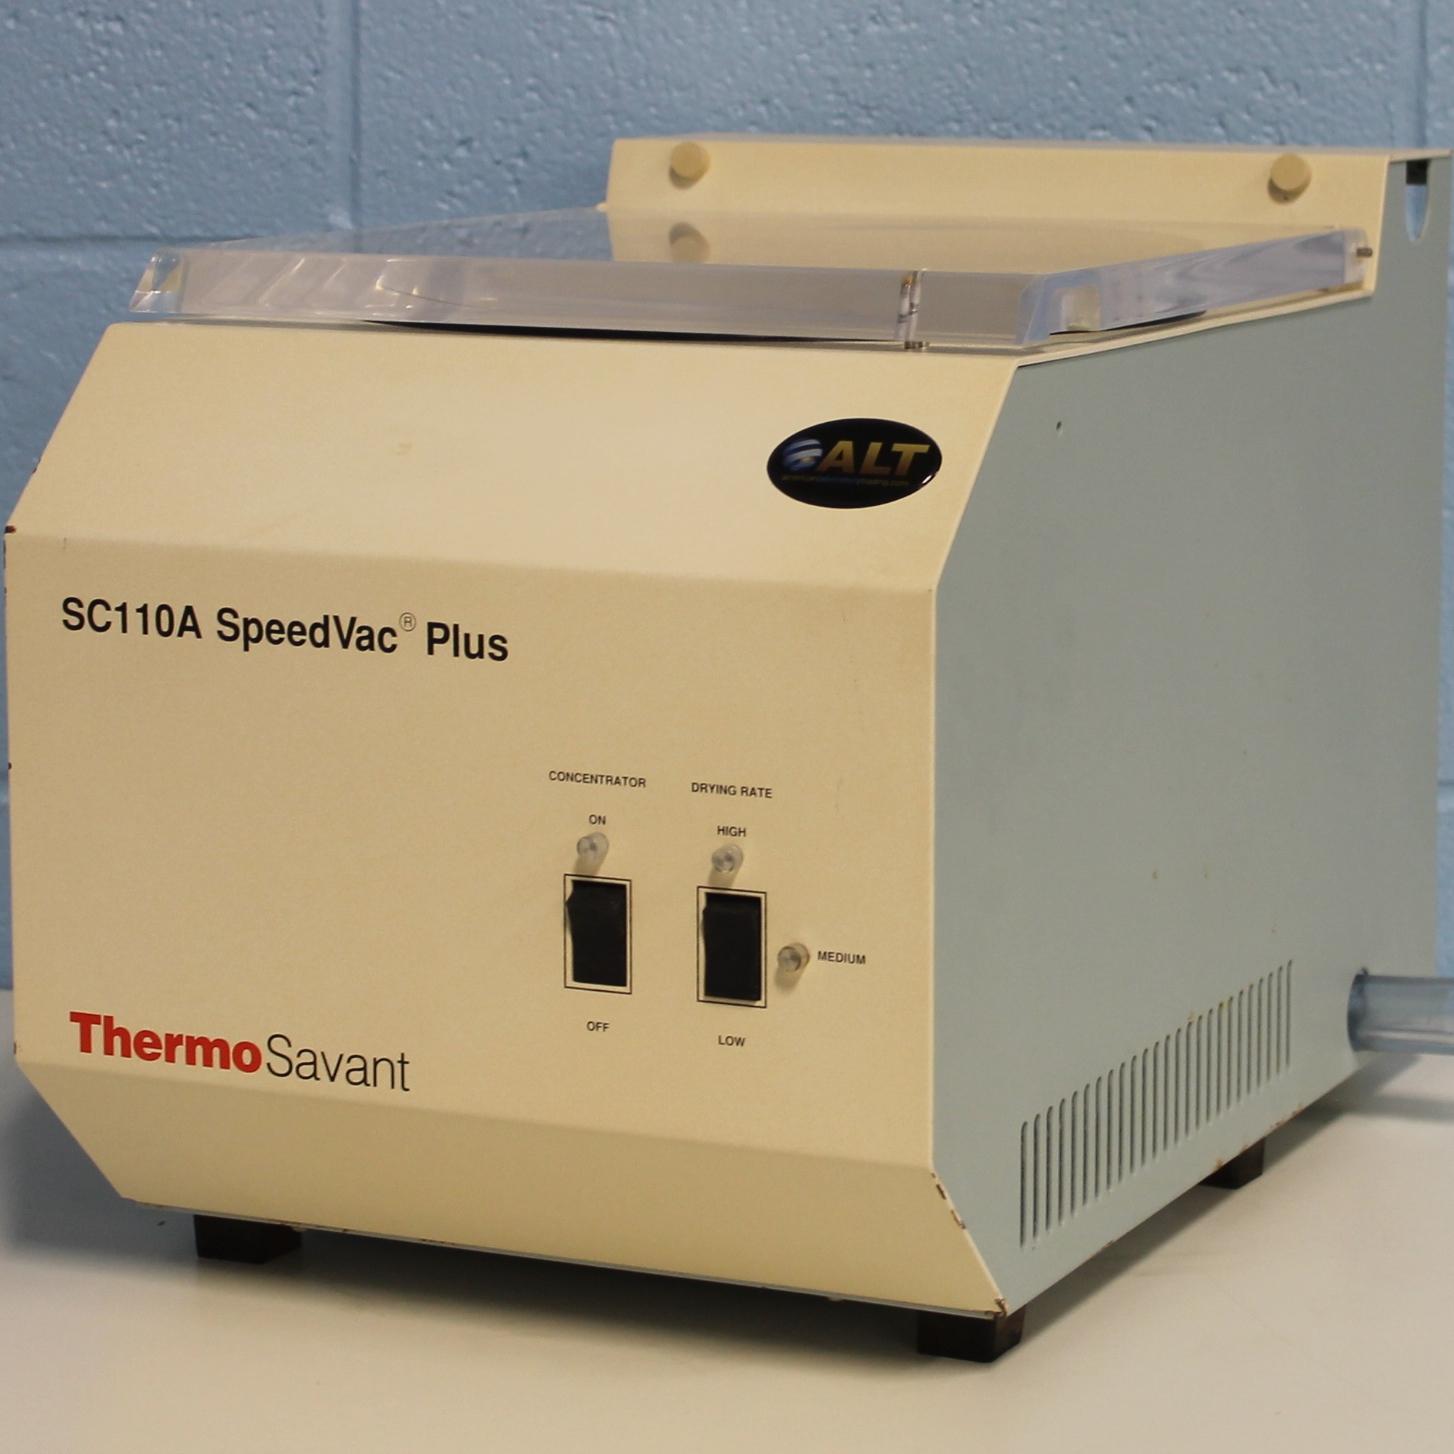 Thermo / Savant SC110A-115 SpeedVac Plus Concentrator Image